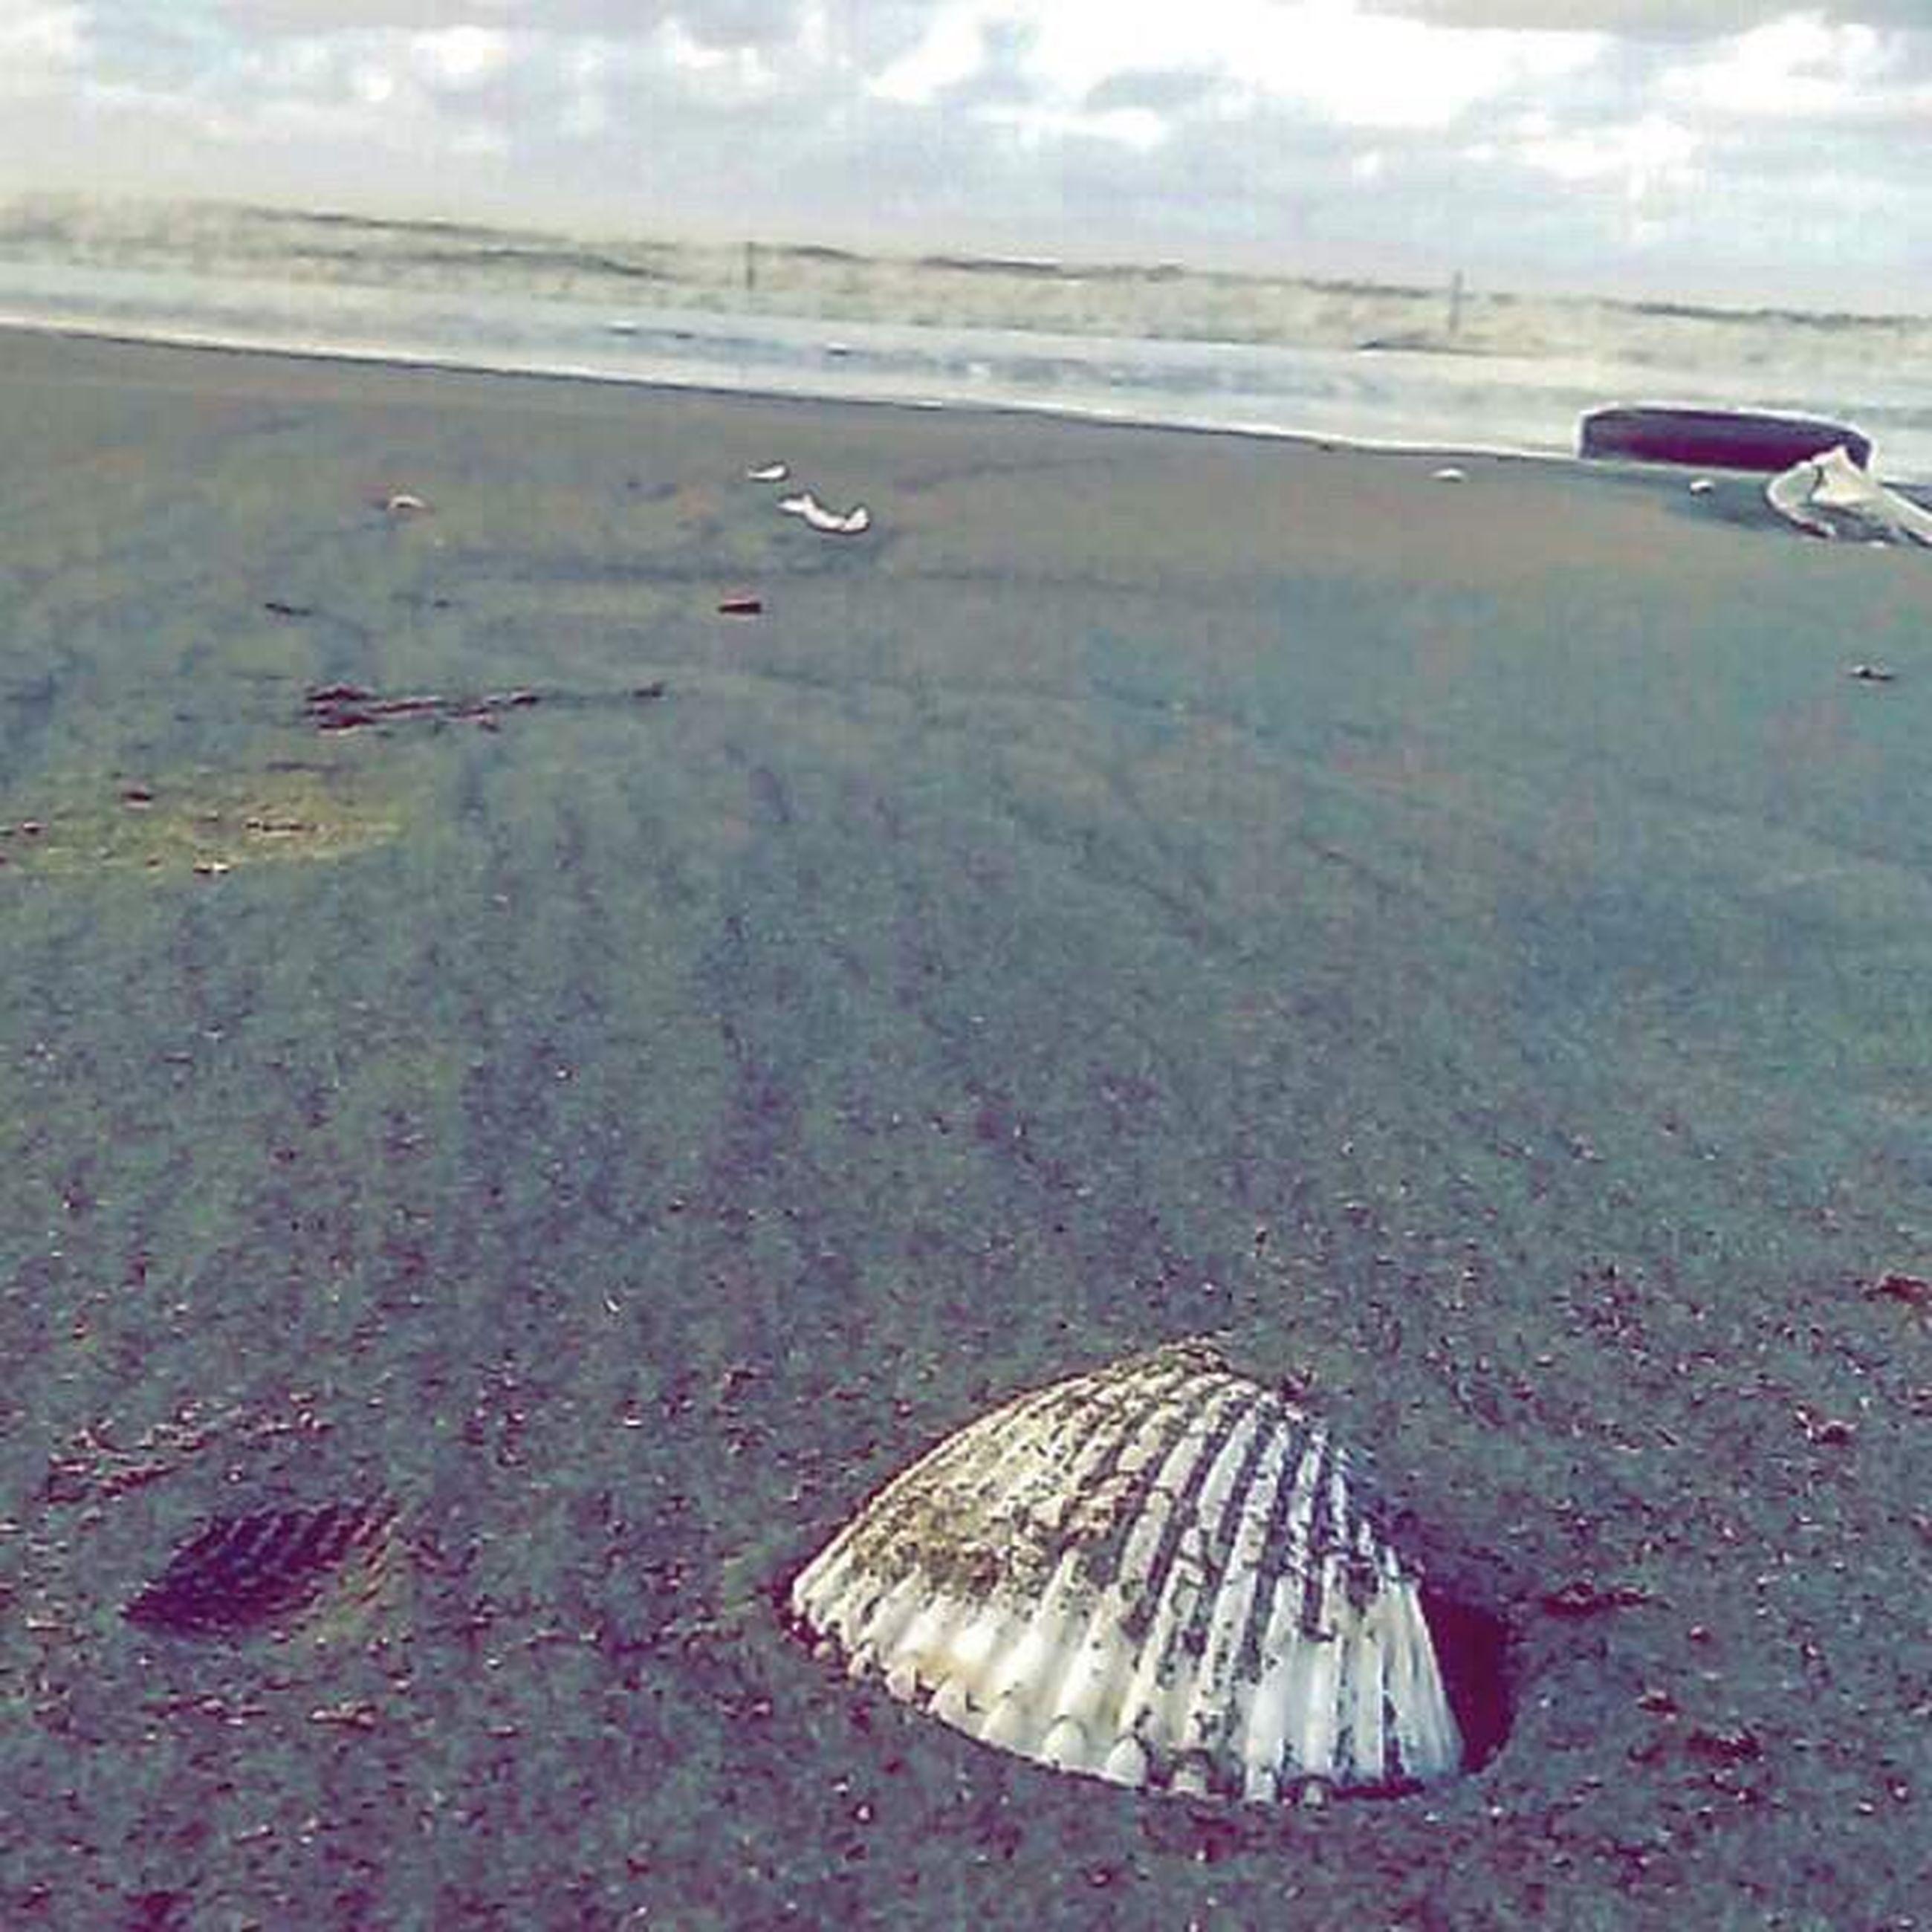 sea, beach, sand, transportation, nature, outdoors, coastline, sea life, water, day, scenics, no people, animal themes, sea turtle